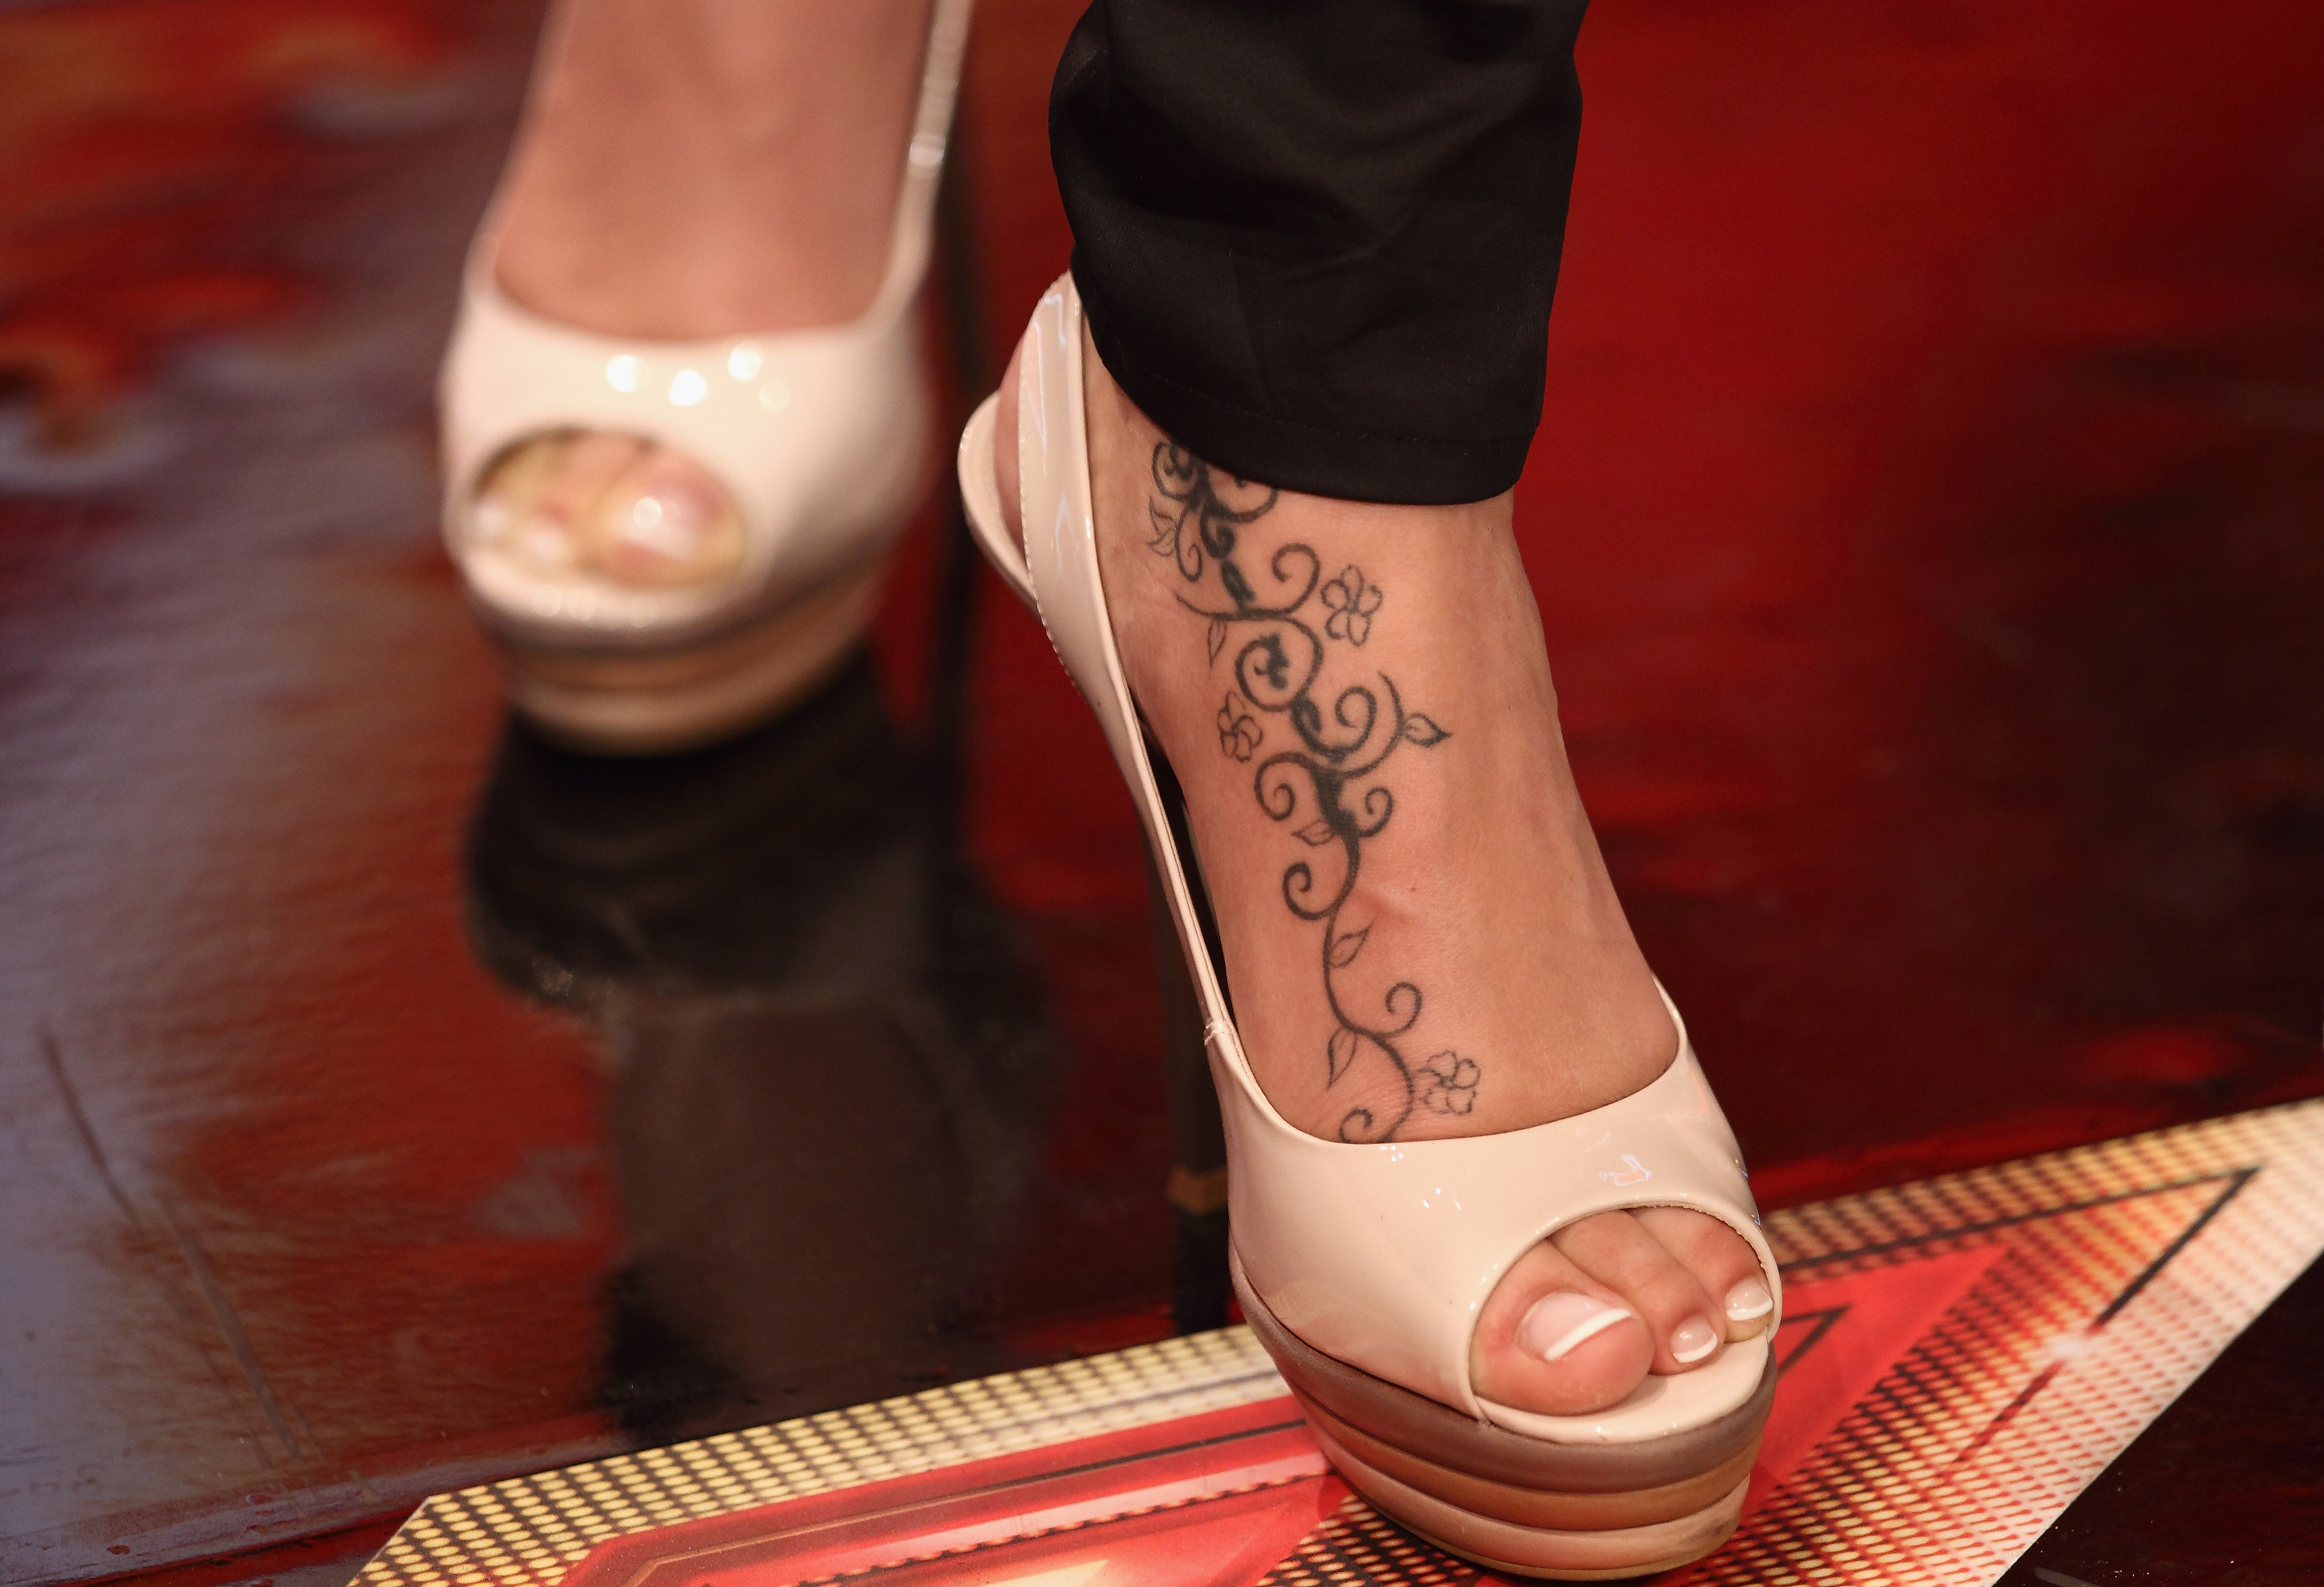 sarah connor feet